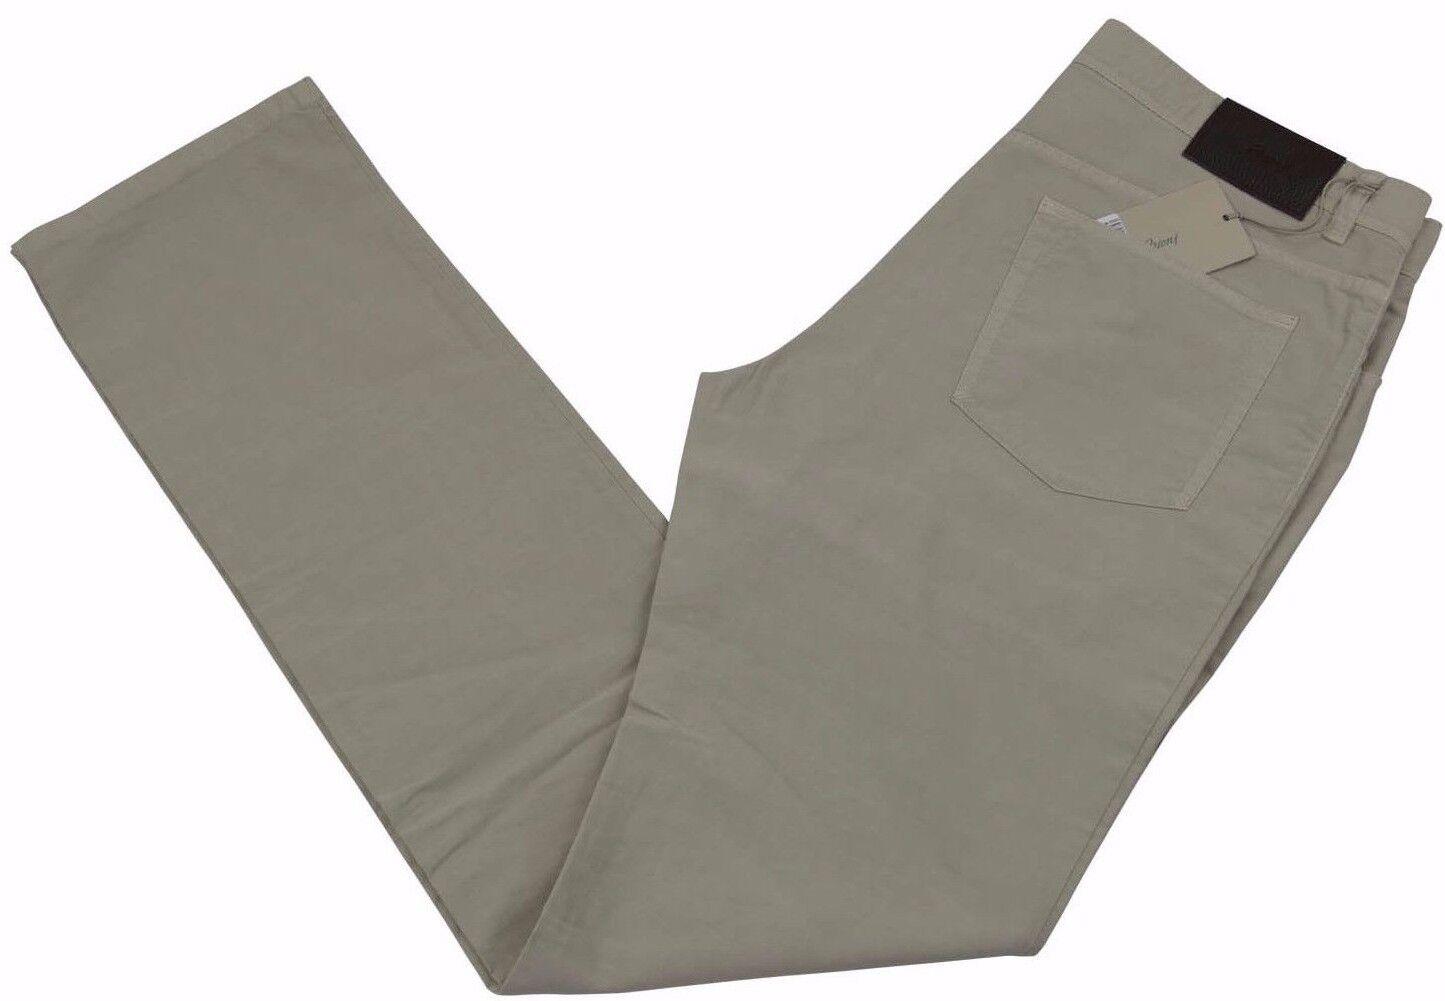 Brioni Livigno Jeans Handmade in  BNWT Luxury Beige Size 38